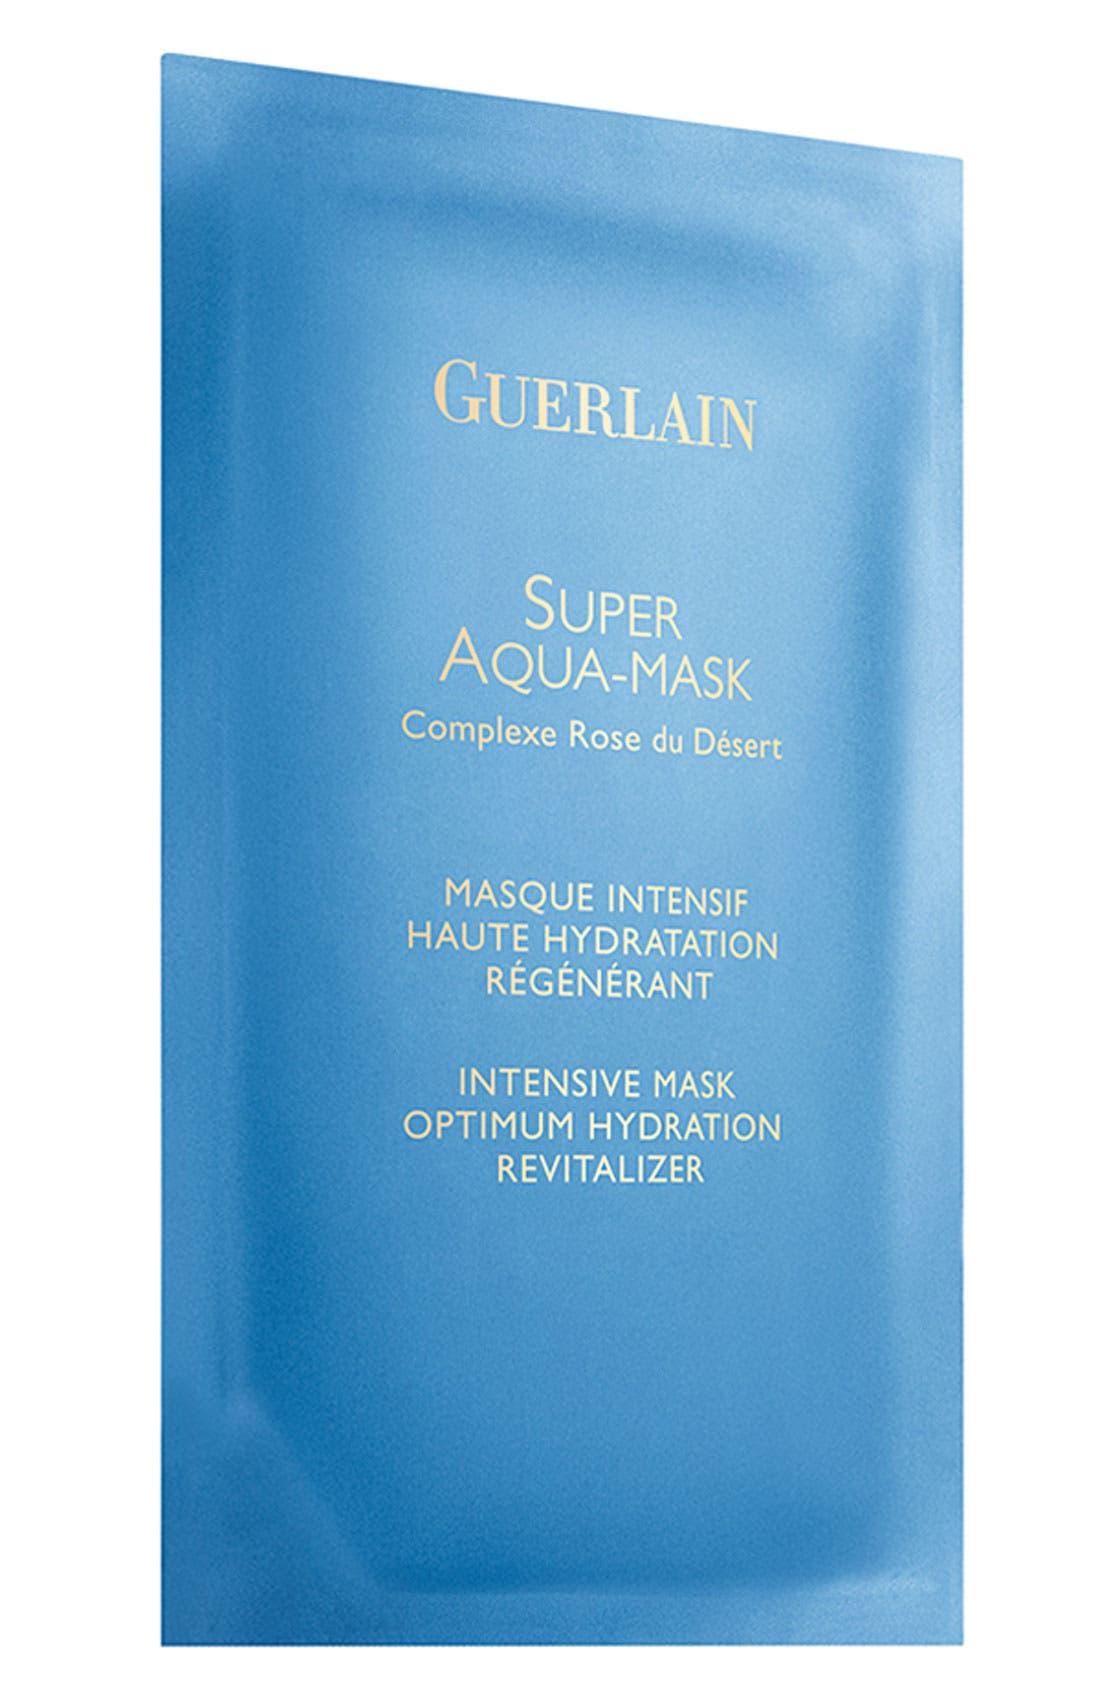 Guerlain 'Super Aqua-Mask' Intensive Mask